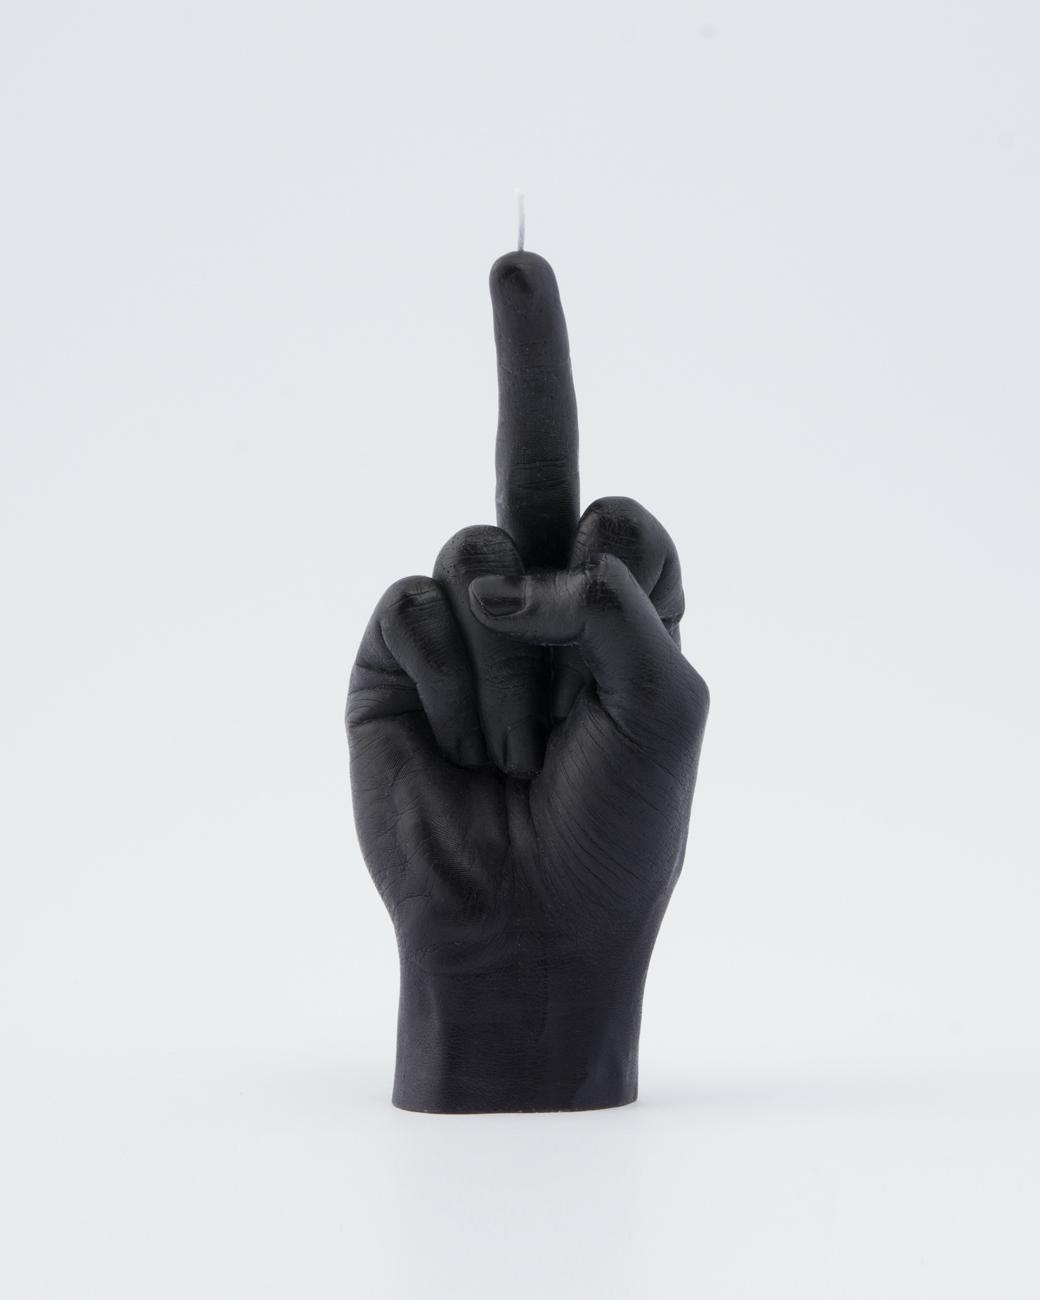 fcuk_you_black_2